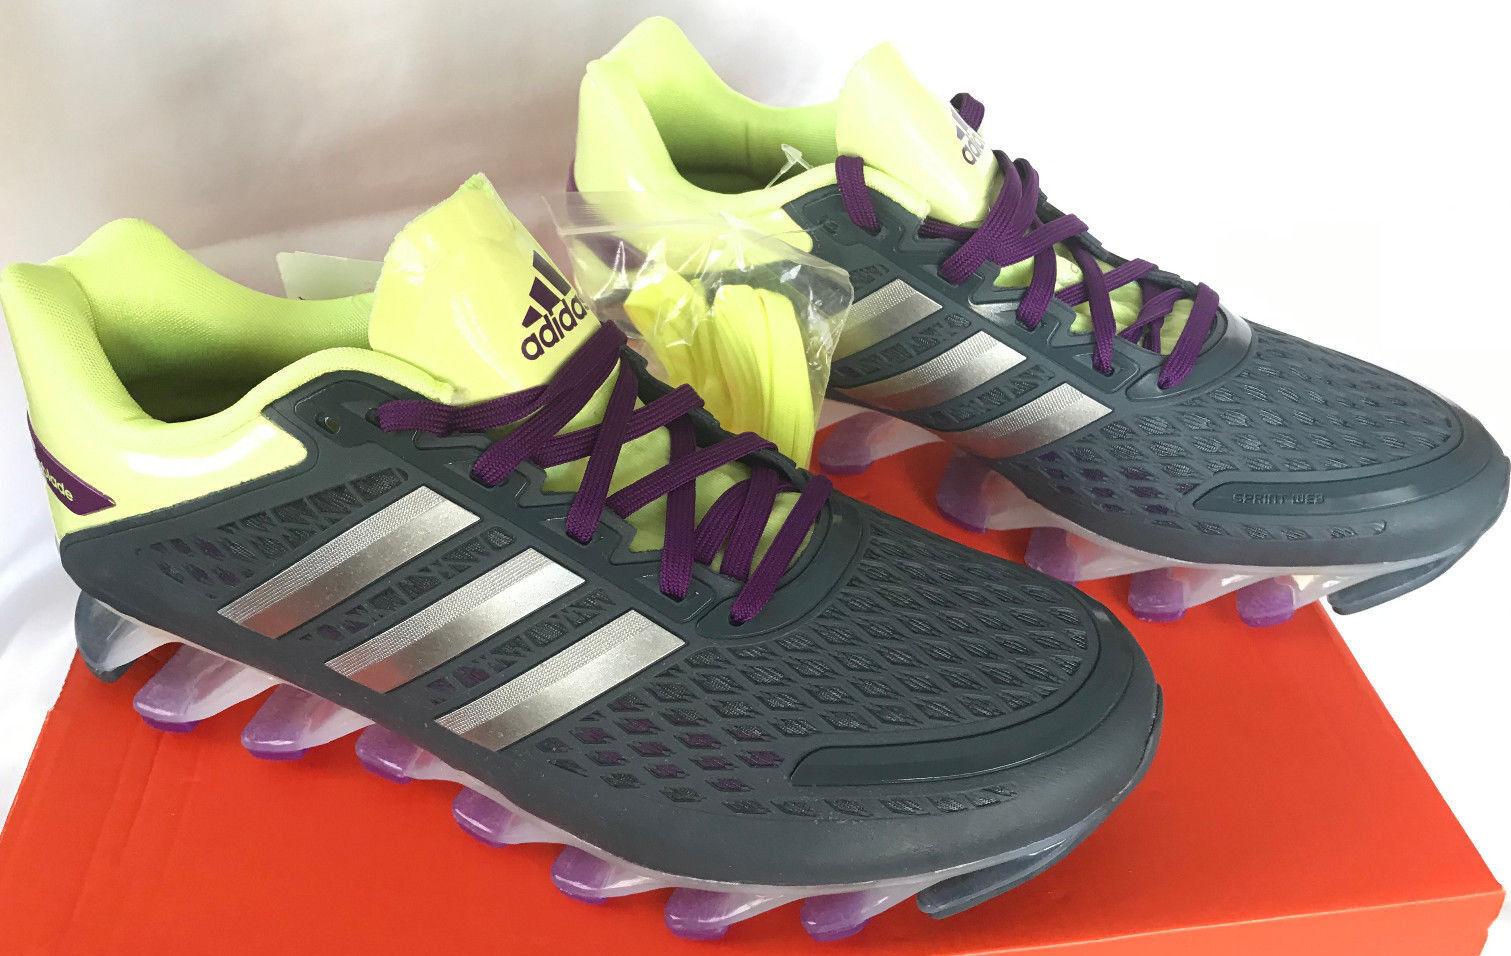 Adidas Springblade Razor W G97688 Glow Silver Marathon Running shoes Women's 8.5